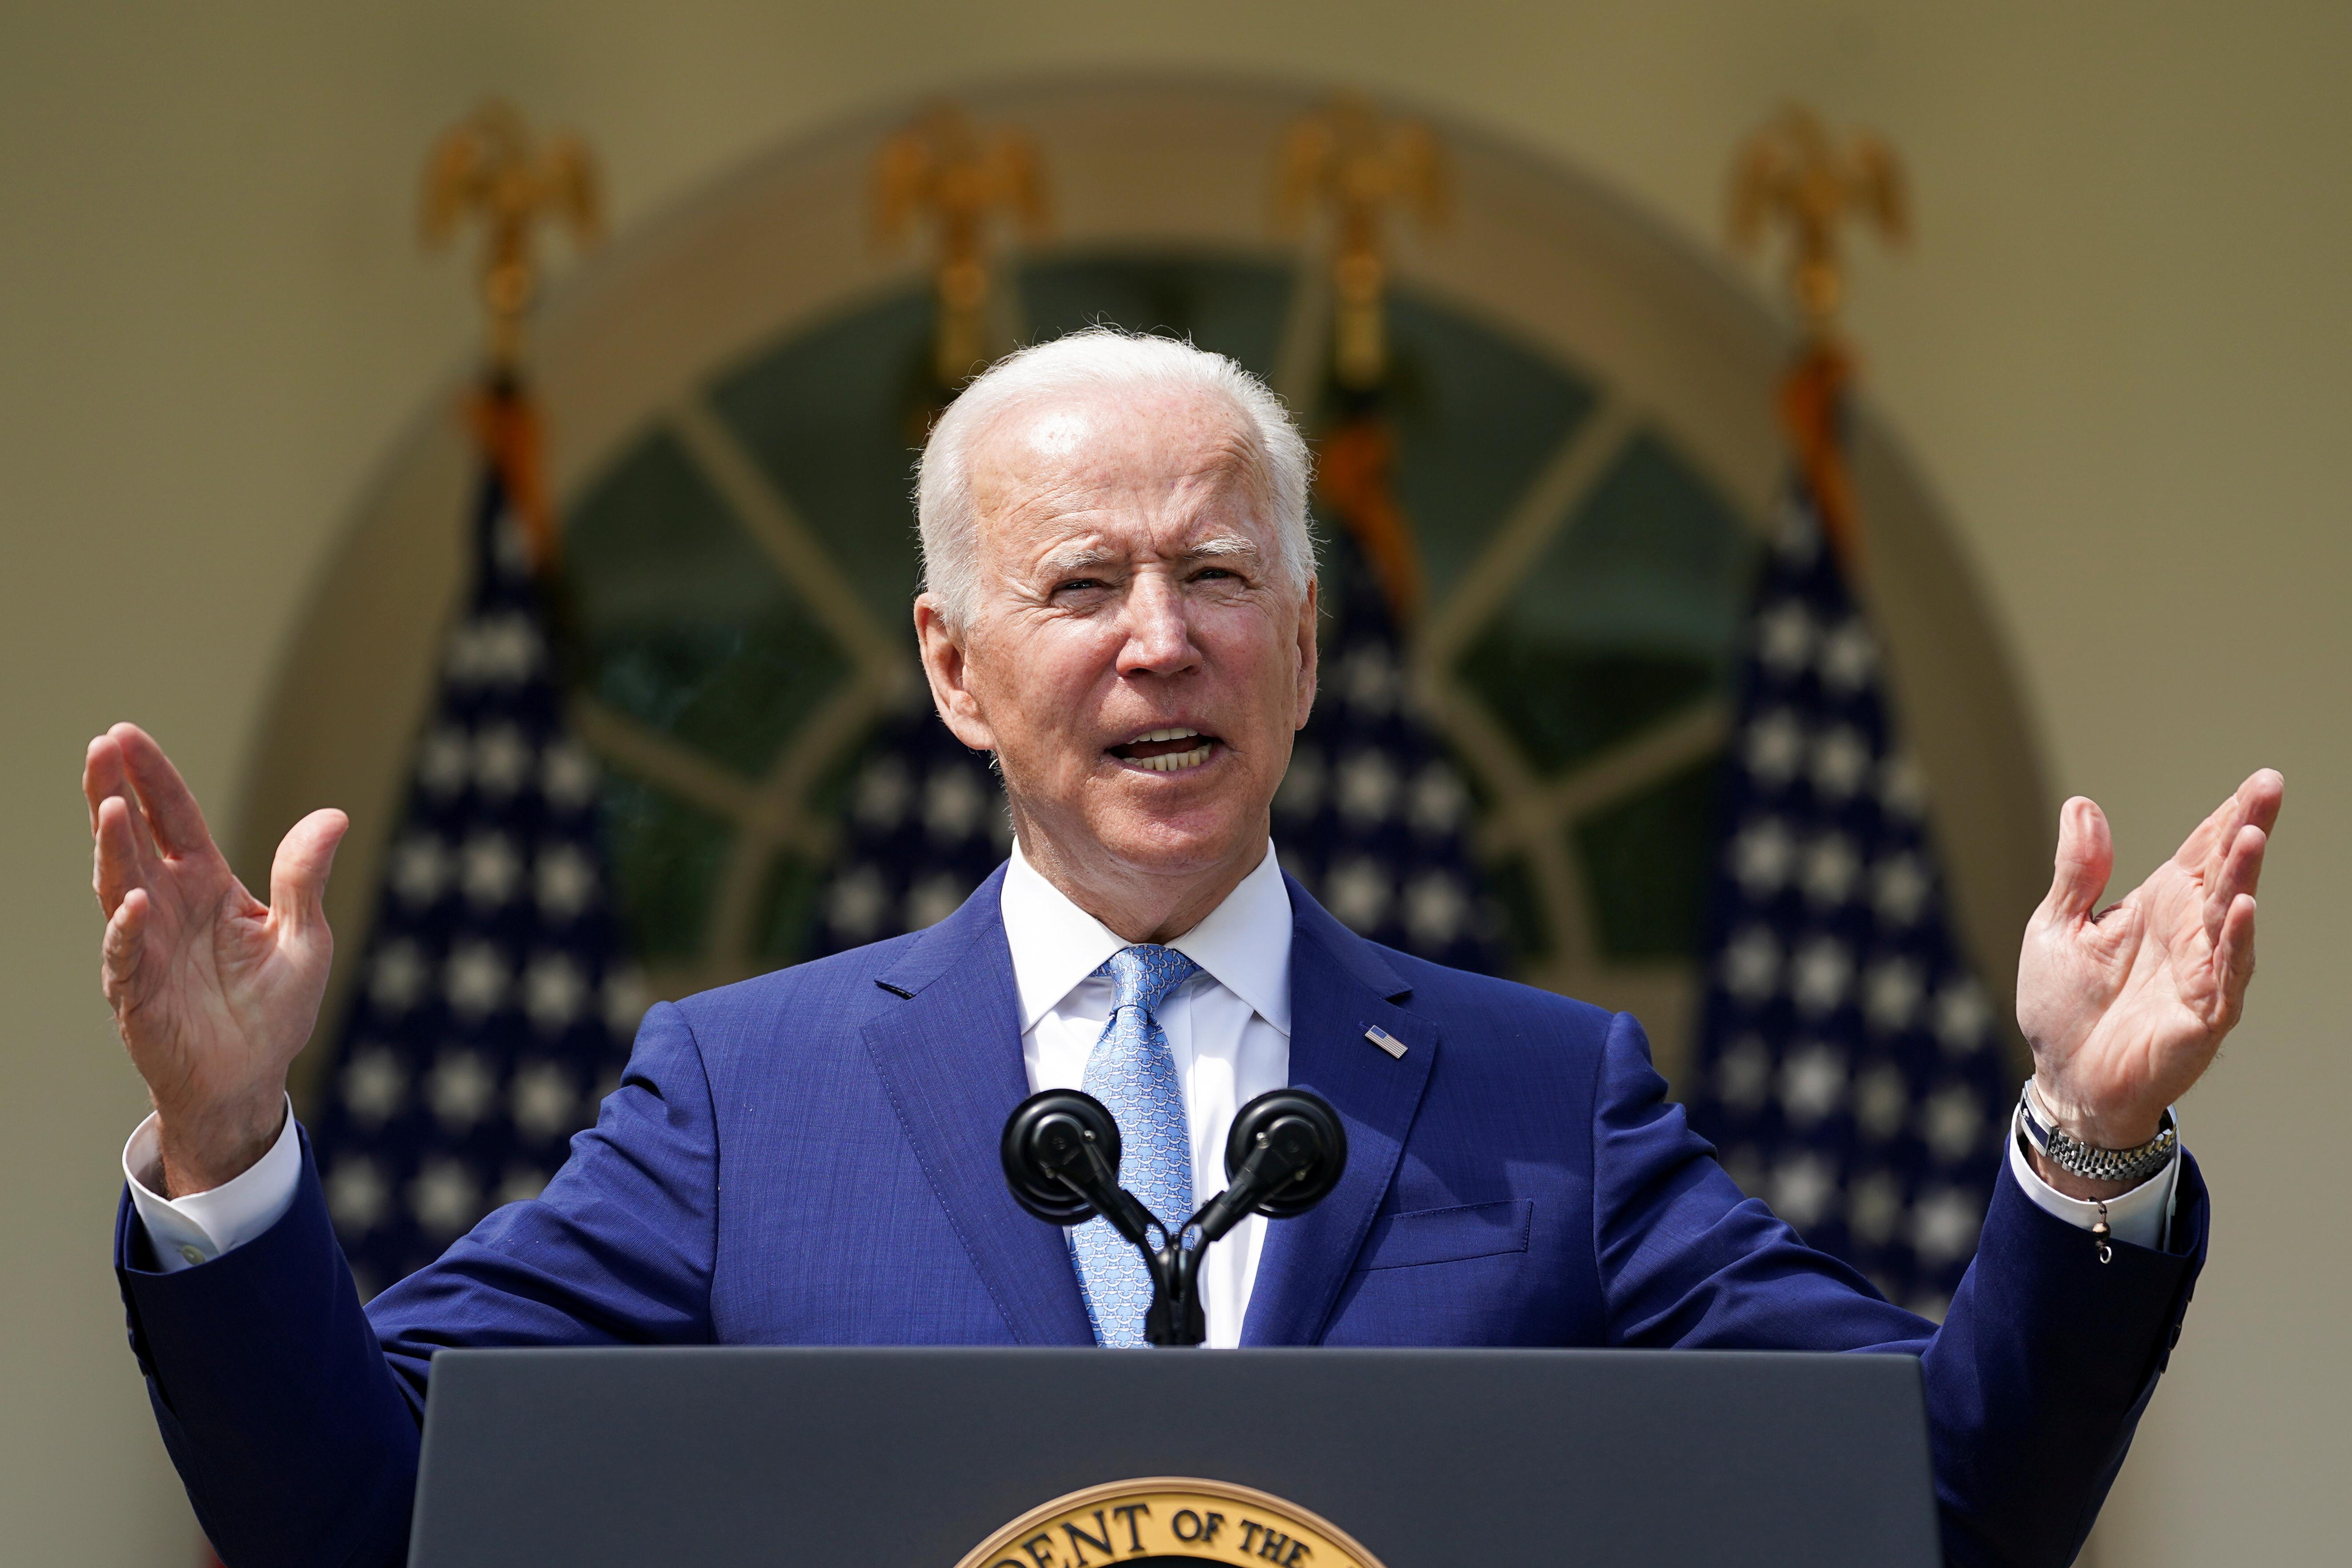 www.reuters.com: Biden's Justice Dept. picks for civil rights, environment to face Senate panel